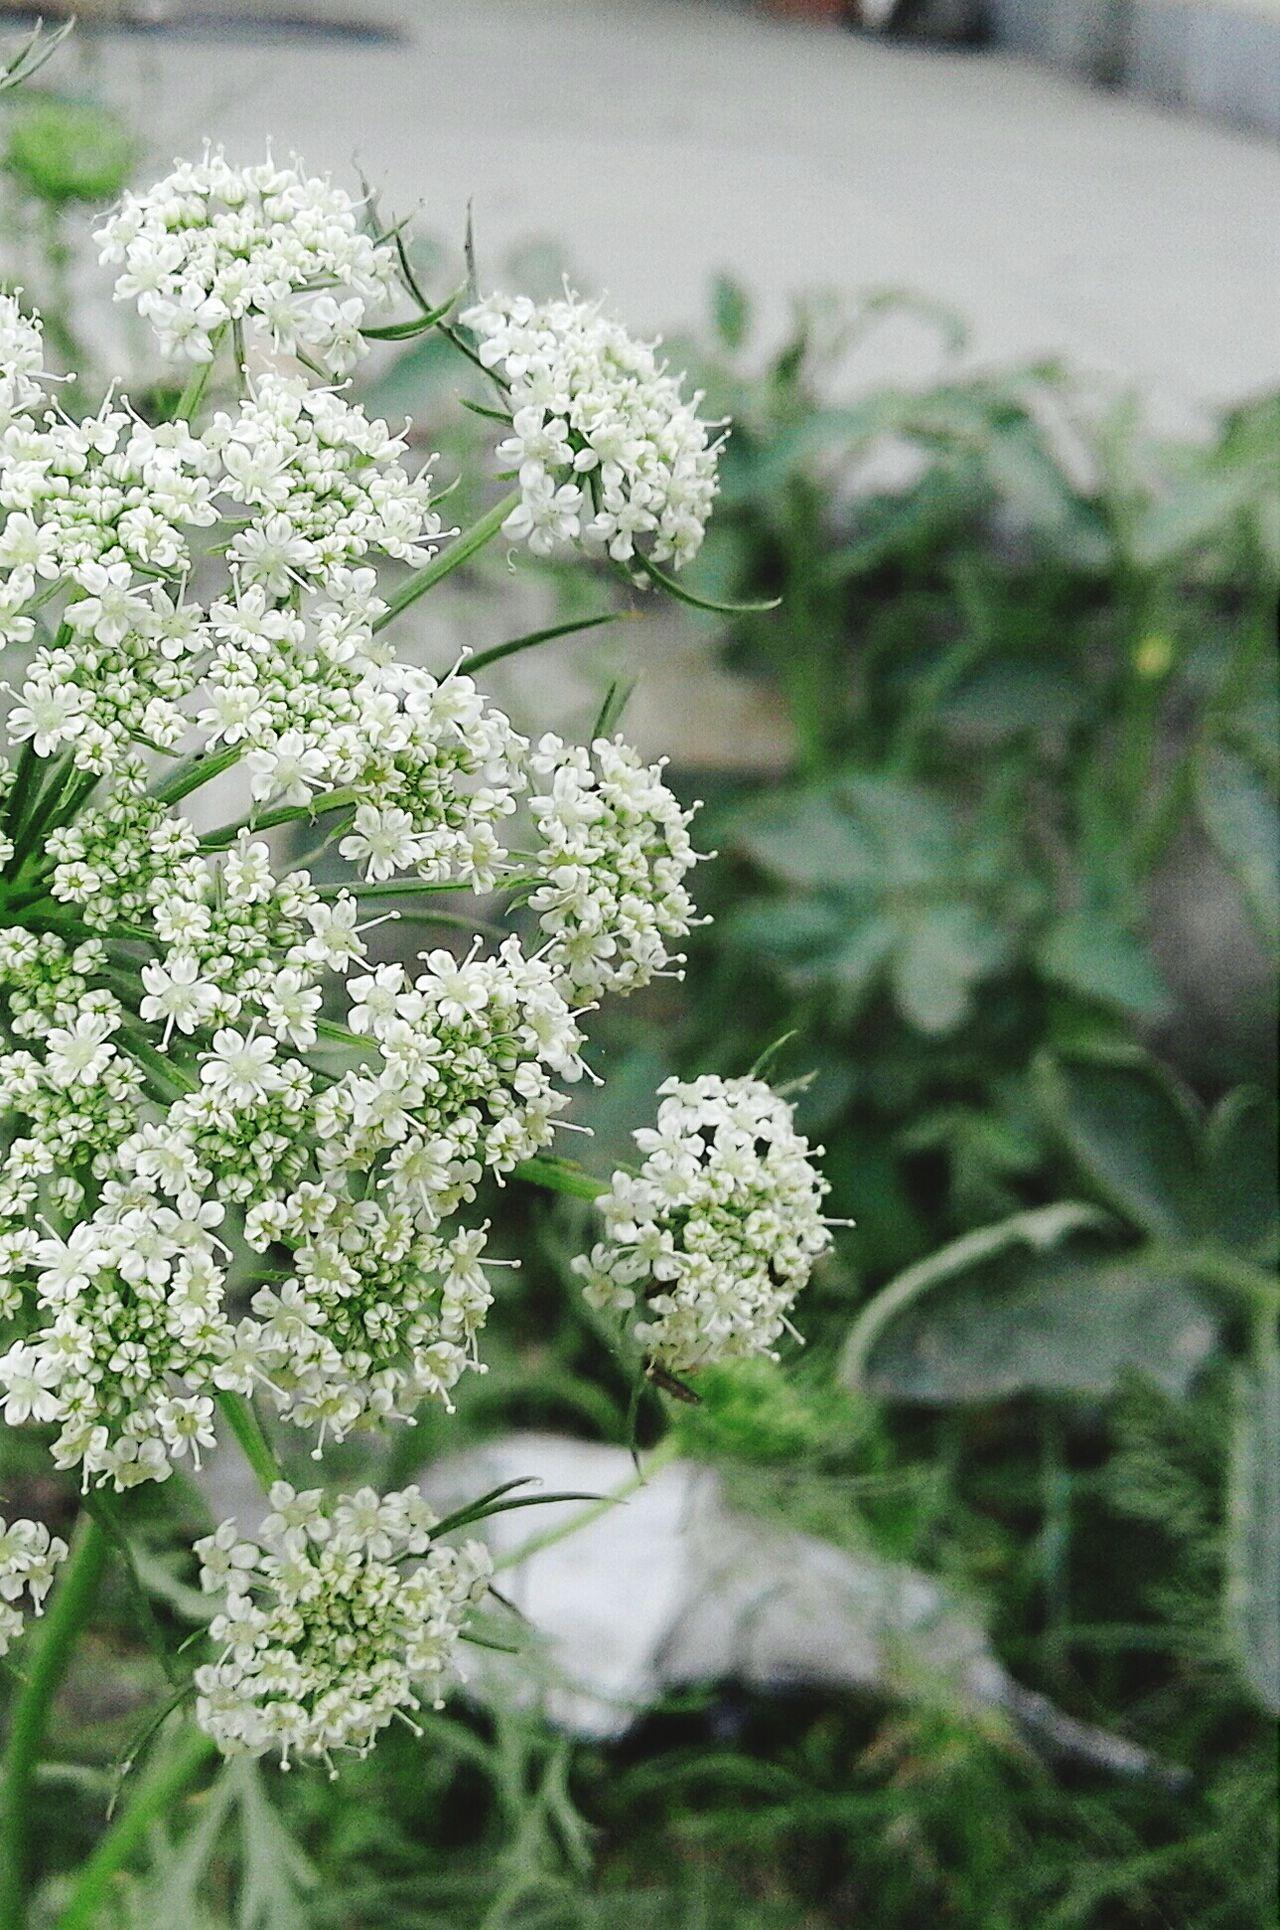 Coriander flowers Taking Photos Things I Like Flowers 🌸🌸🌸 Showcase April Vegetable Flower Show Us Your Takeaway! Popular Week On Eyeem